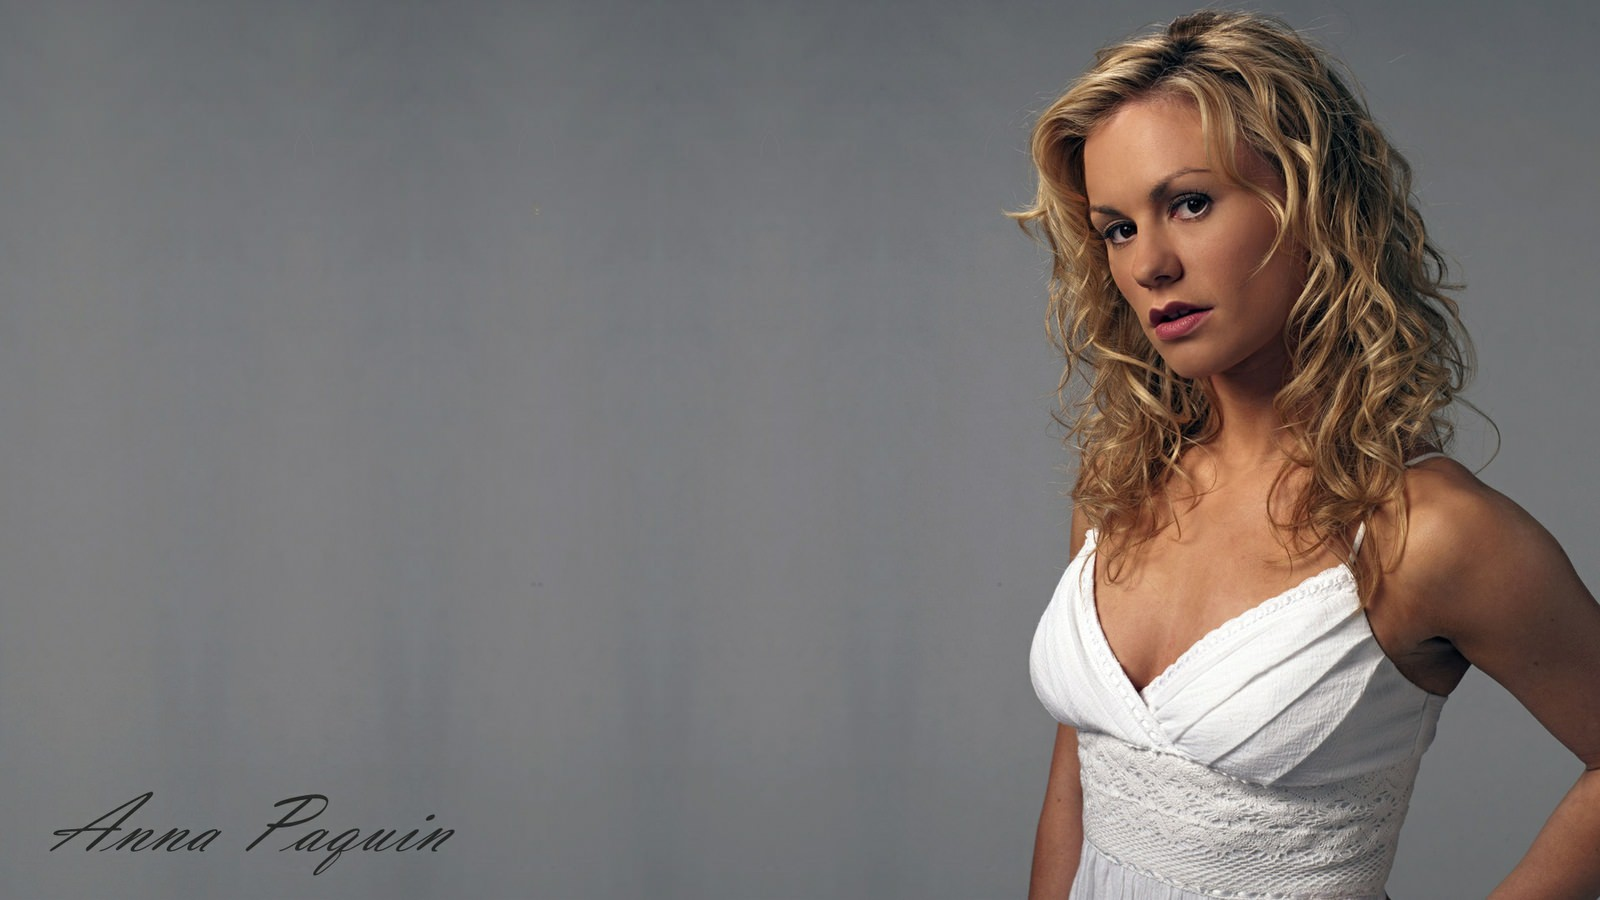 Anna Paquin_beautiful